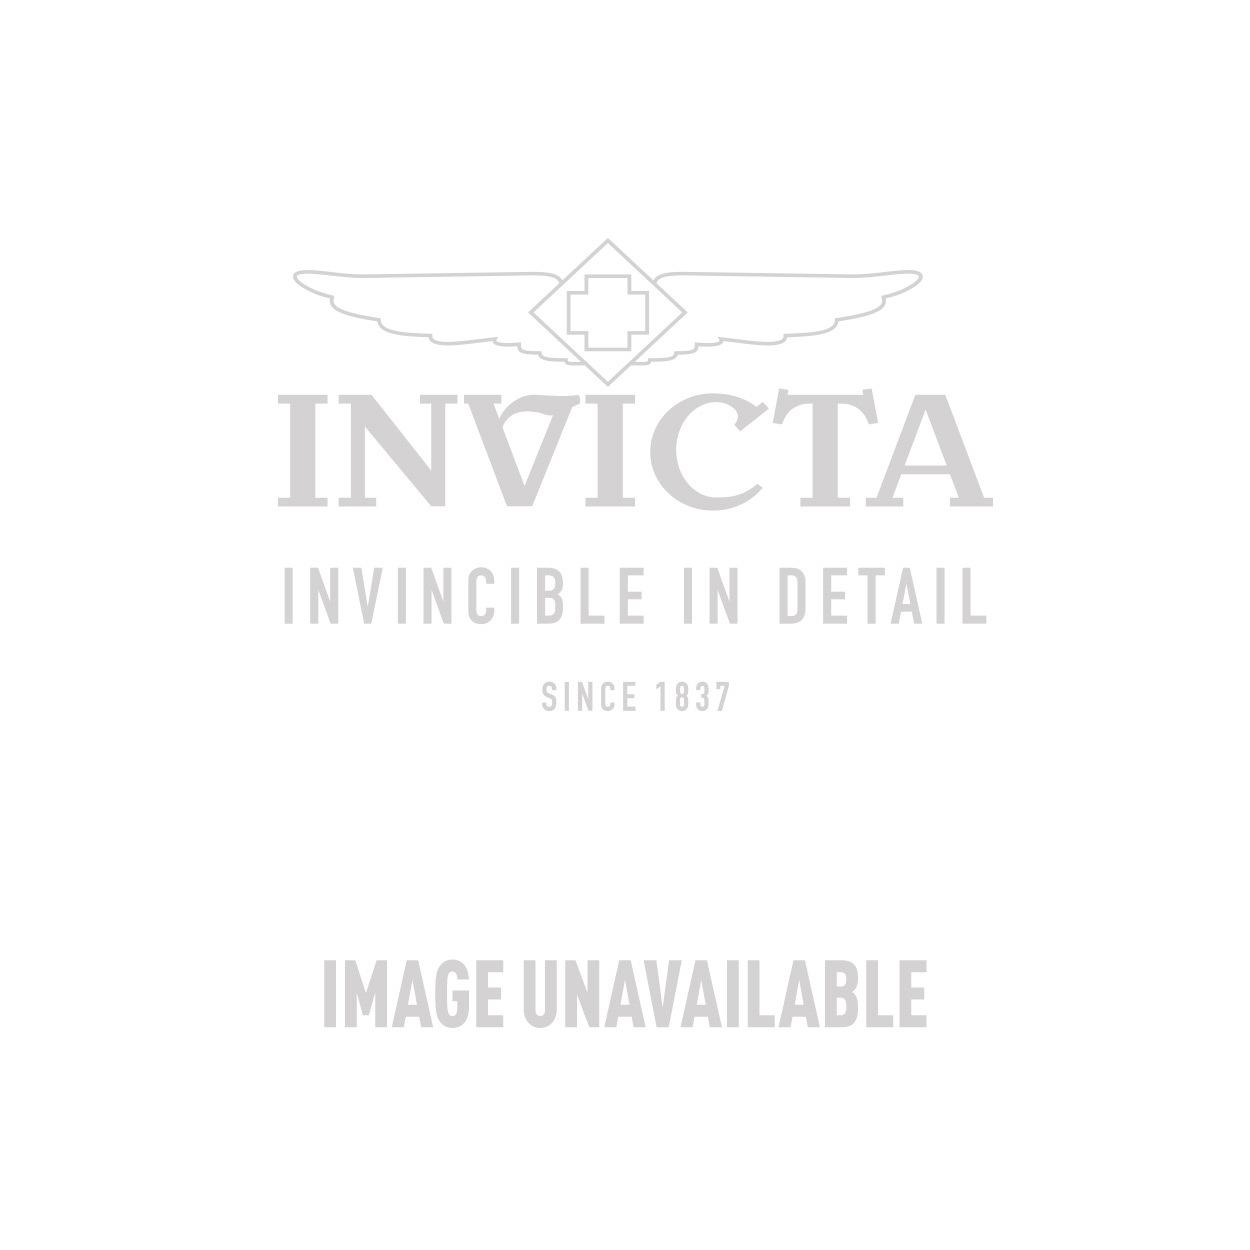 Invicta Speedway Swiss Movement Quartz Watch - Stainless Steel case Stainless Steel band - Model 17713